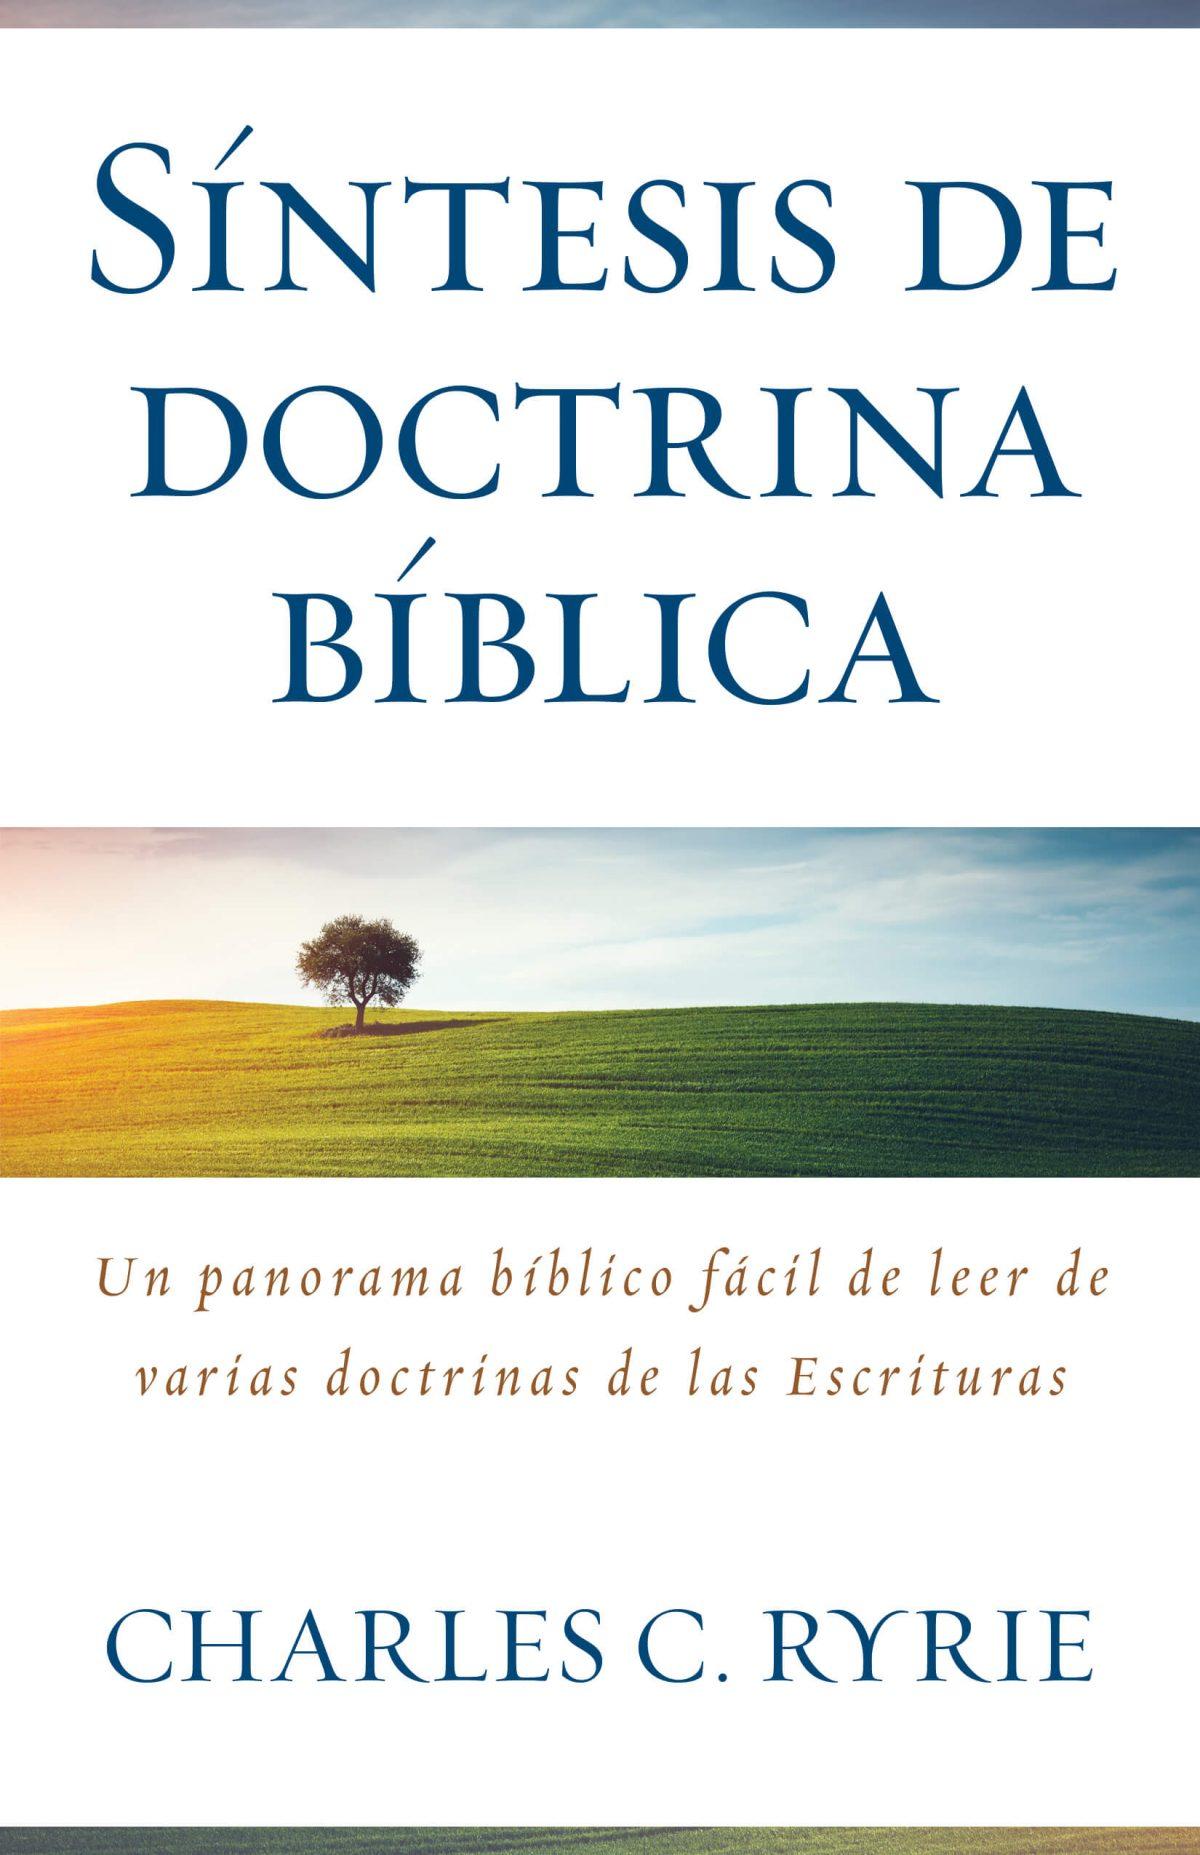 SINTESIS DE DOCTRINA BIBLICA